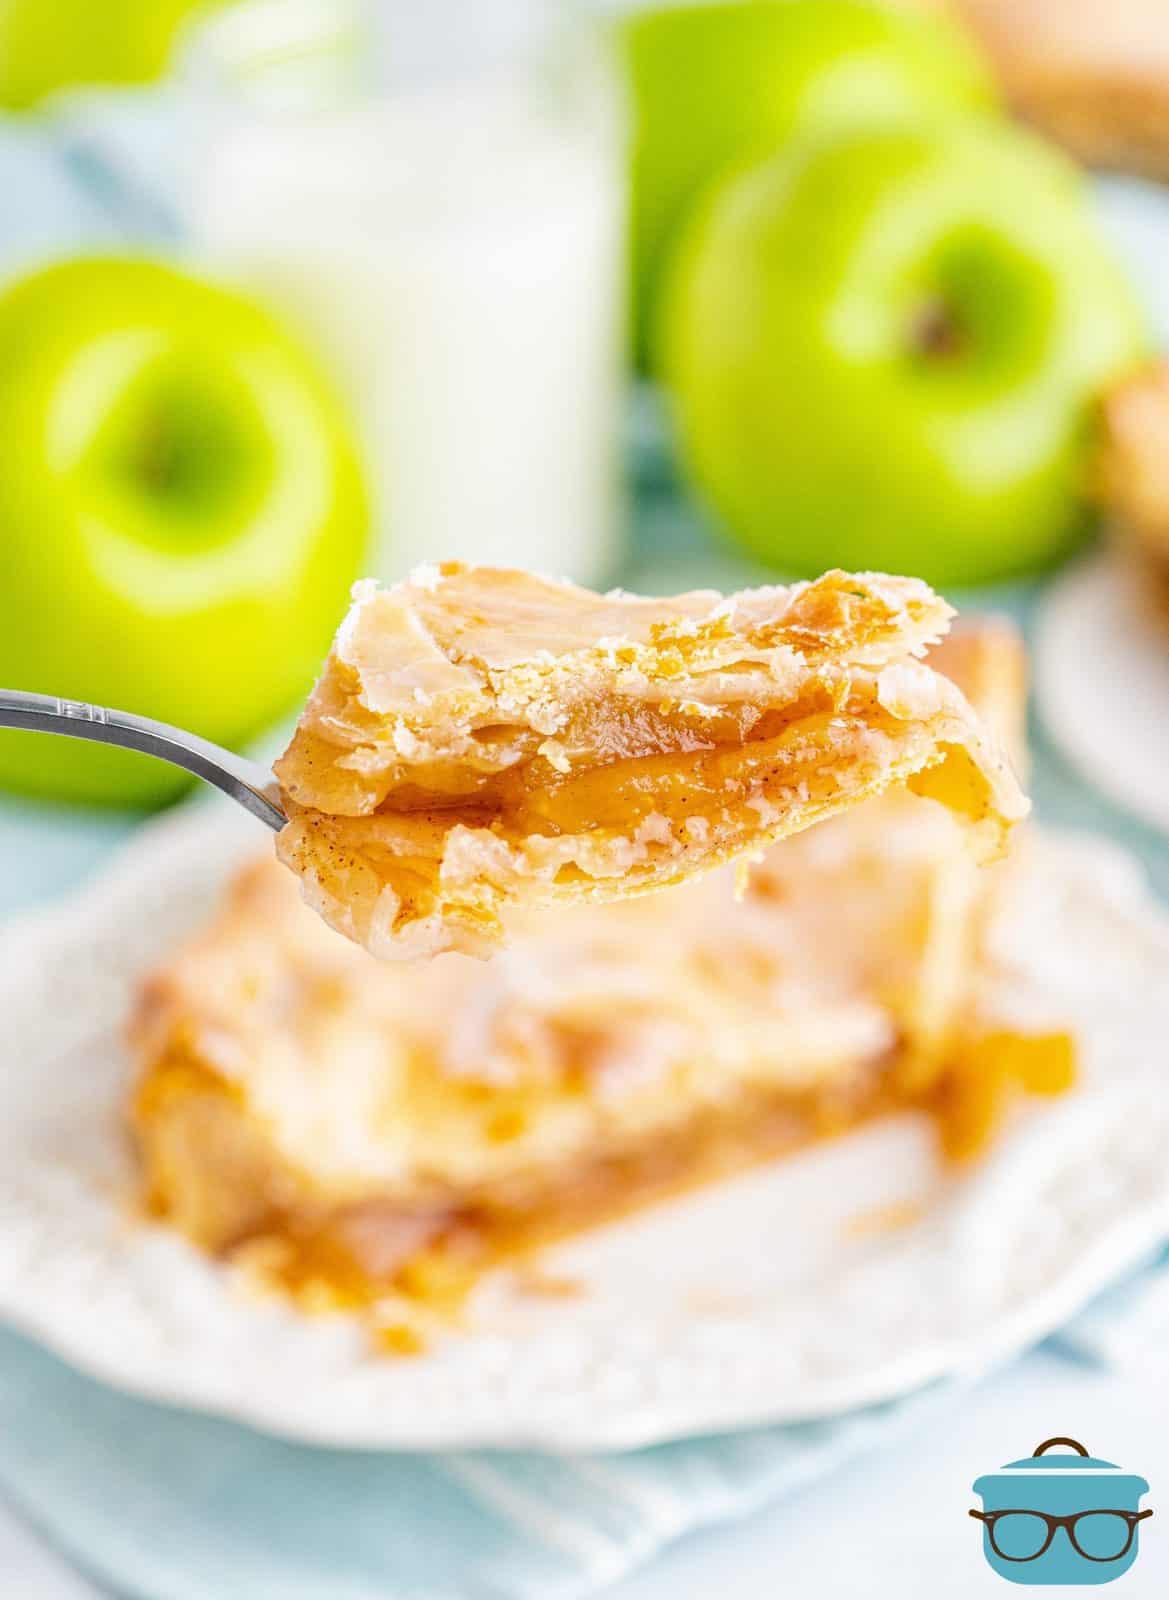 Fork holding up bite of Apple Slab Pie.